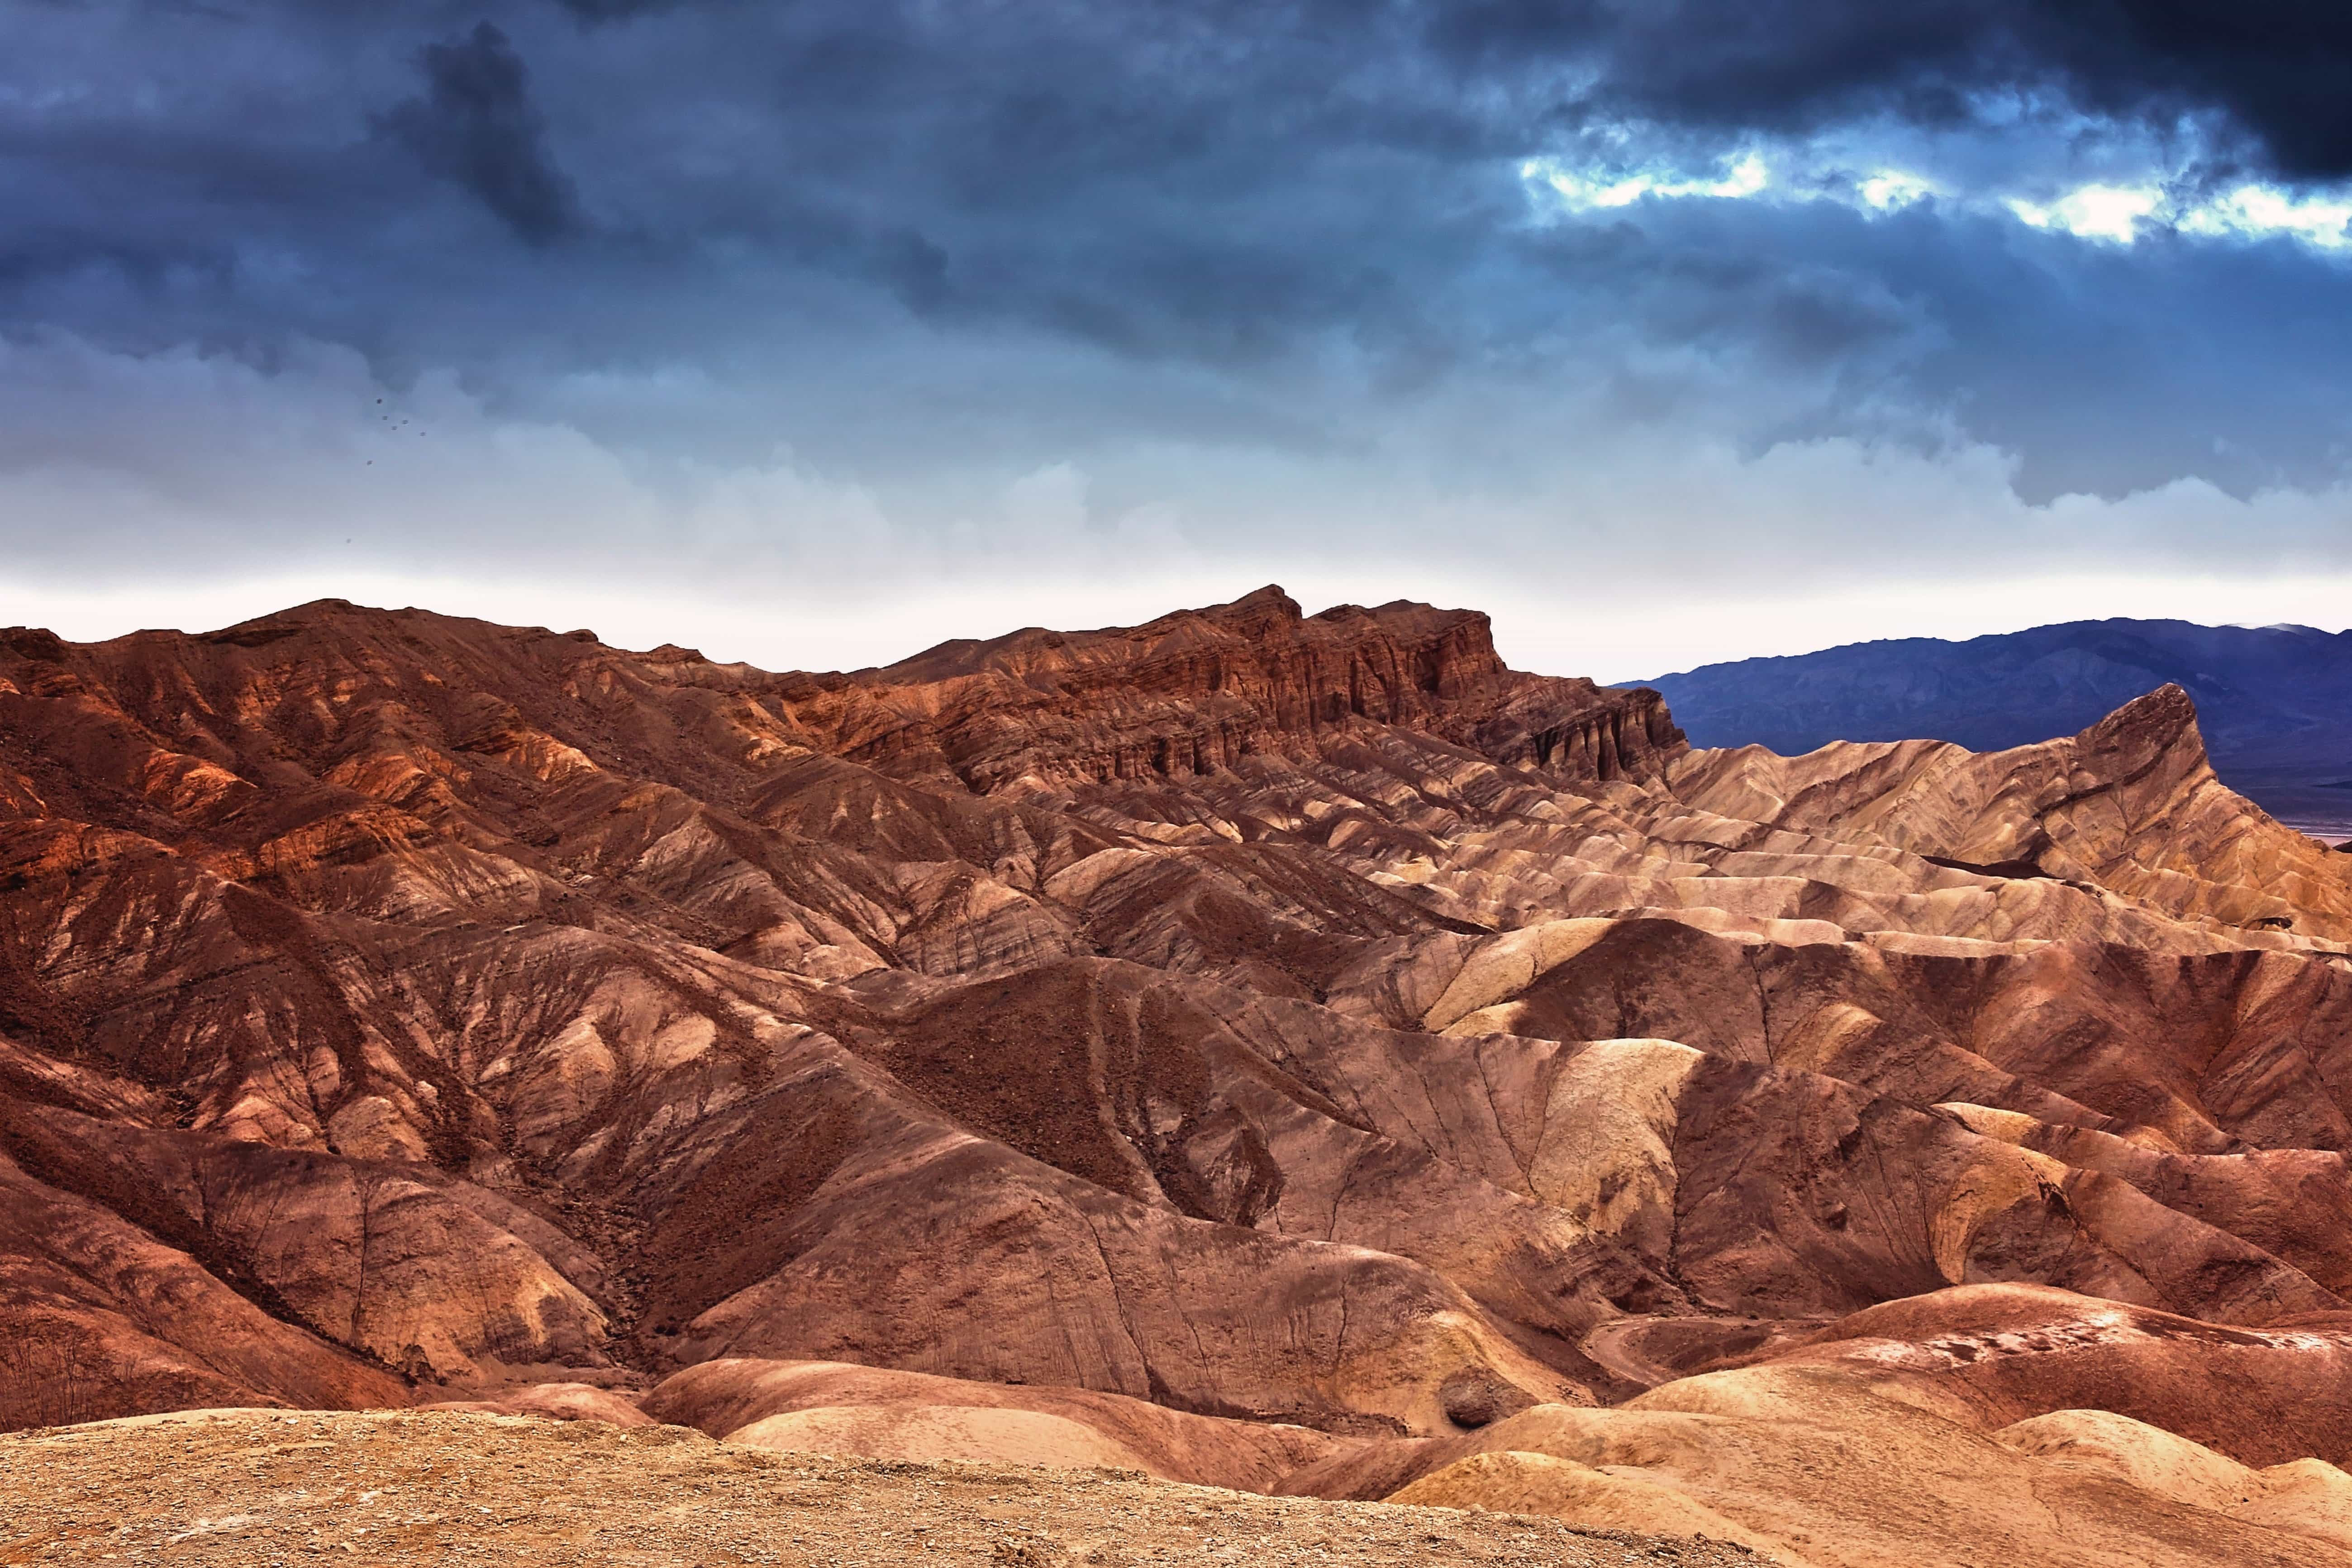 Beautiful Wallpaper Hd Free Picture Desert Landscape Cloud Sandstone Canyon